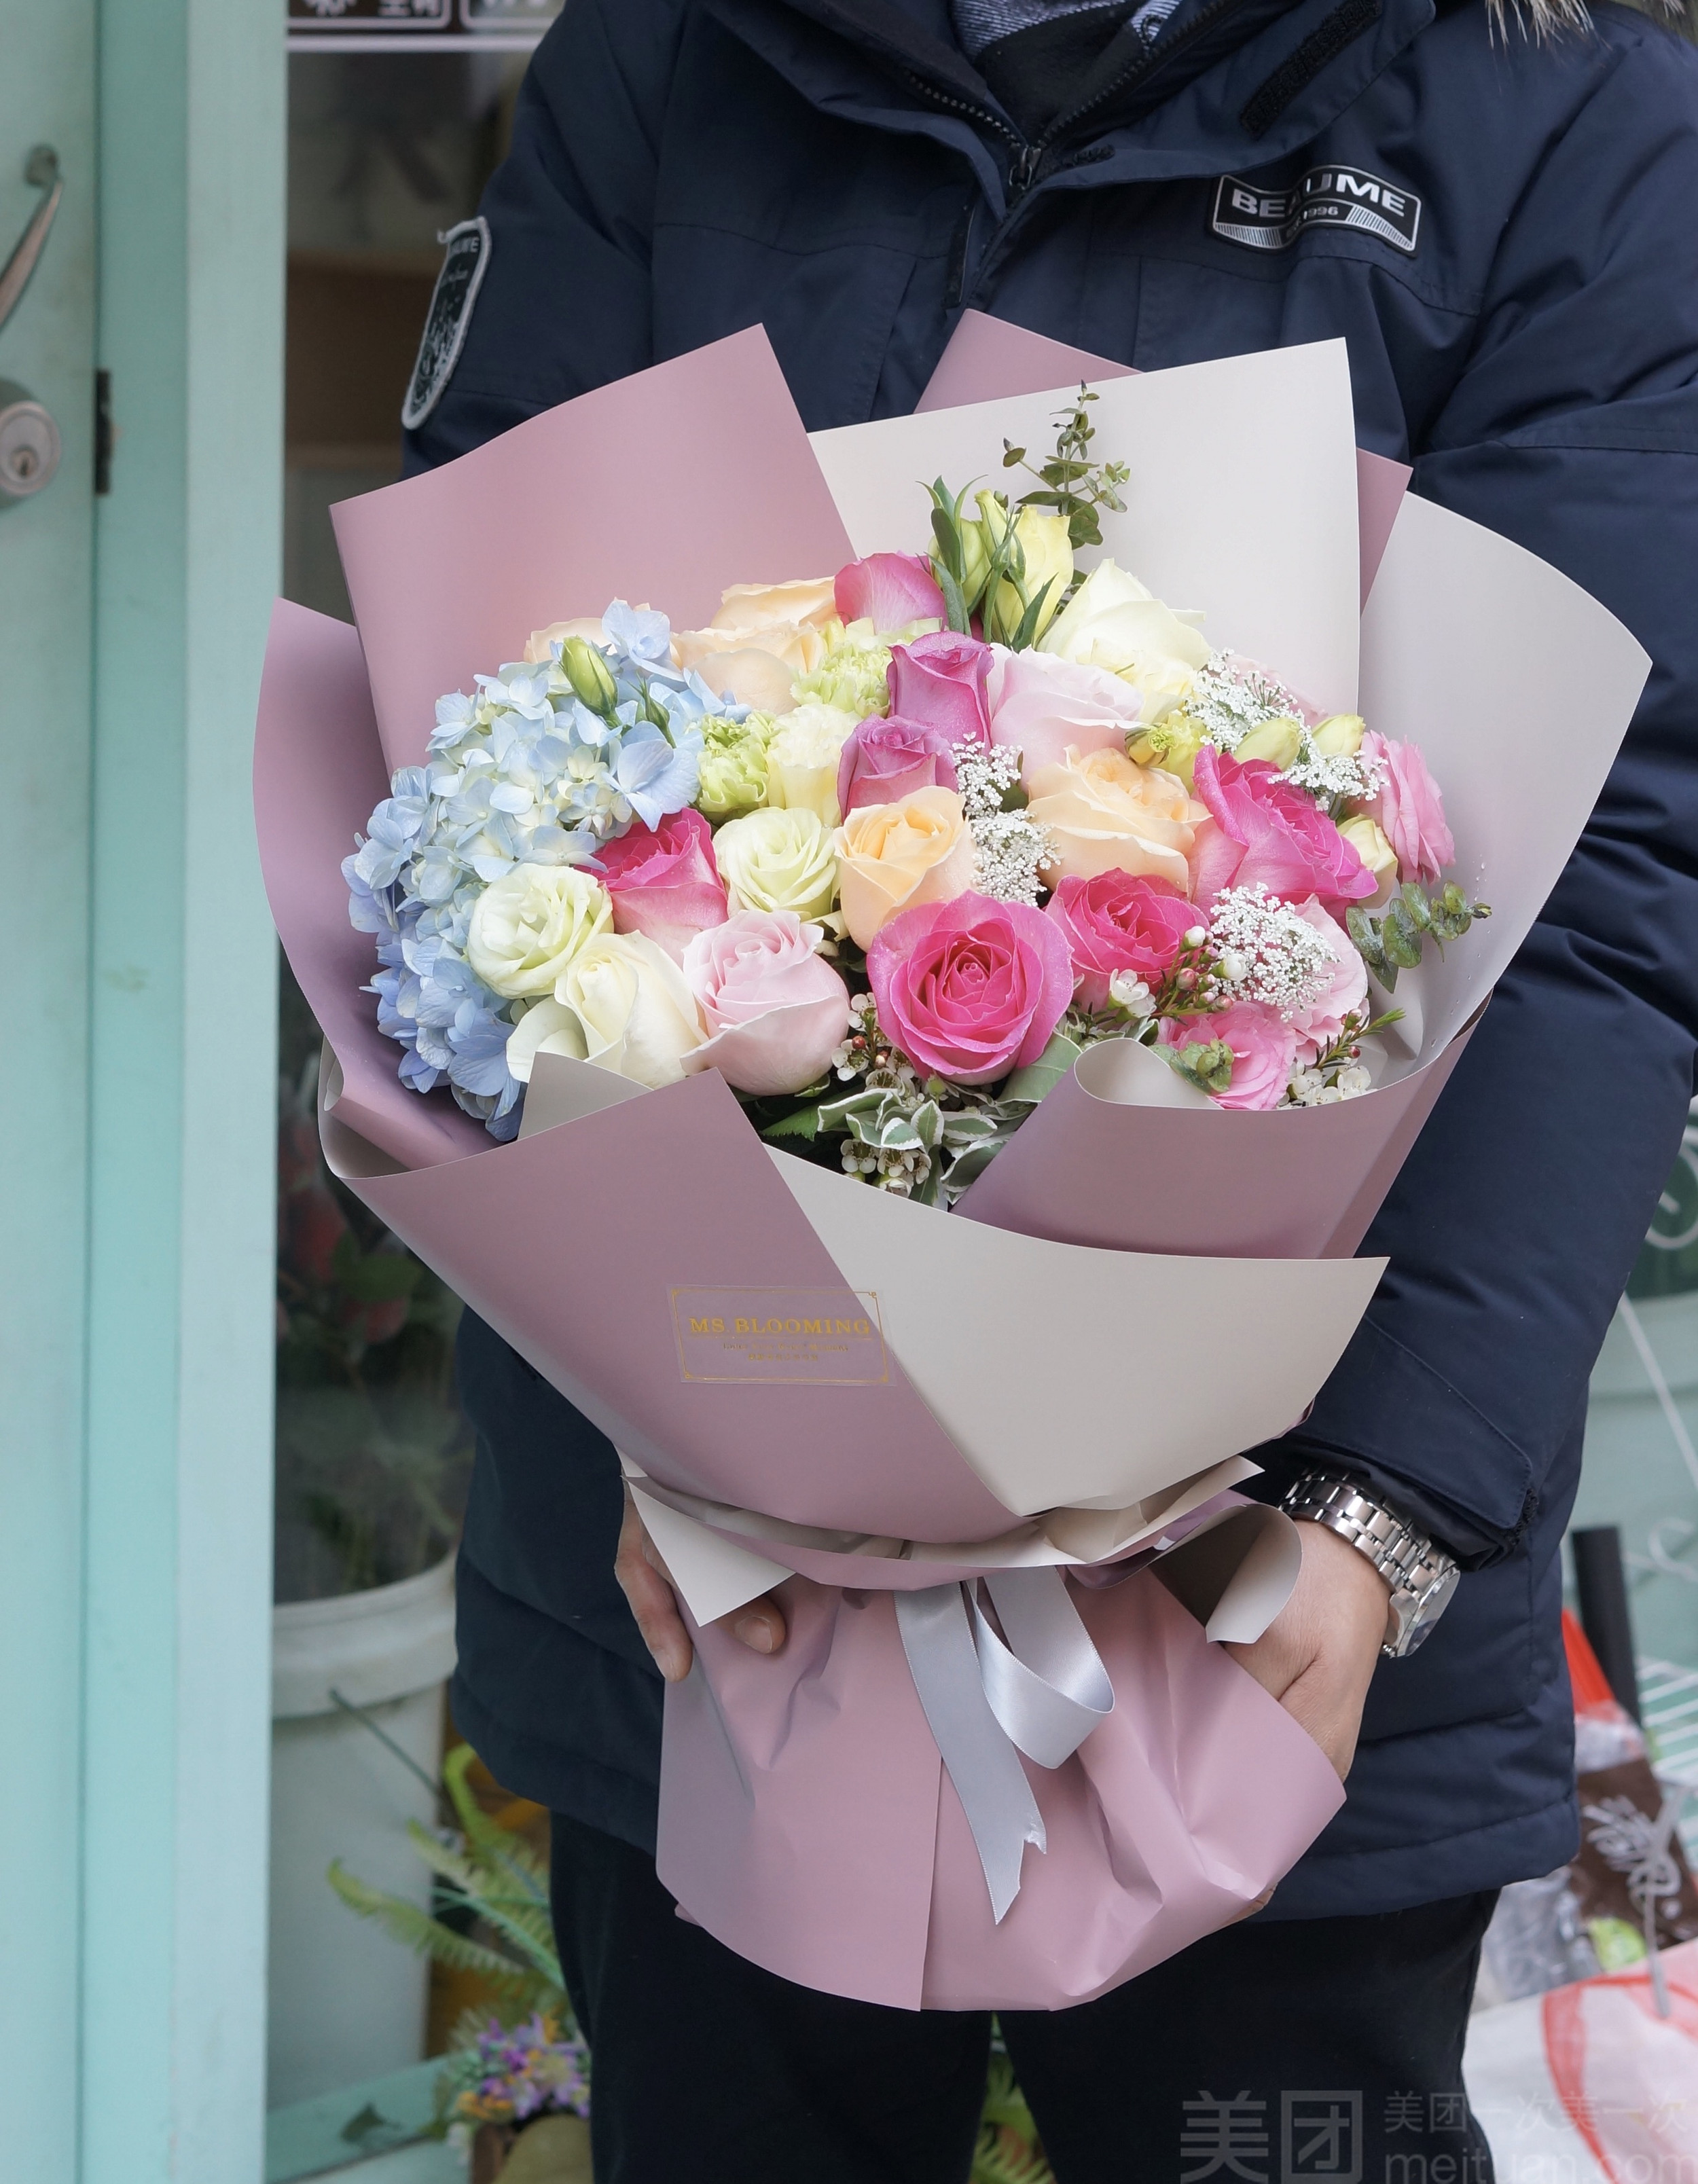 ms.blooming 绽放花生活